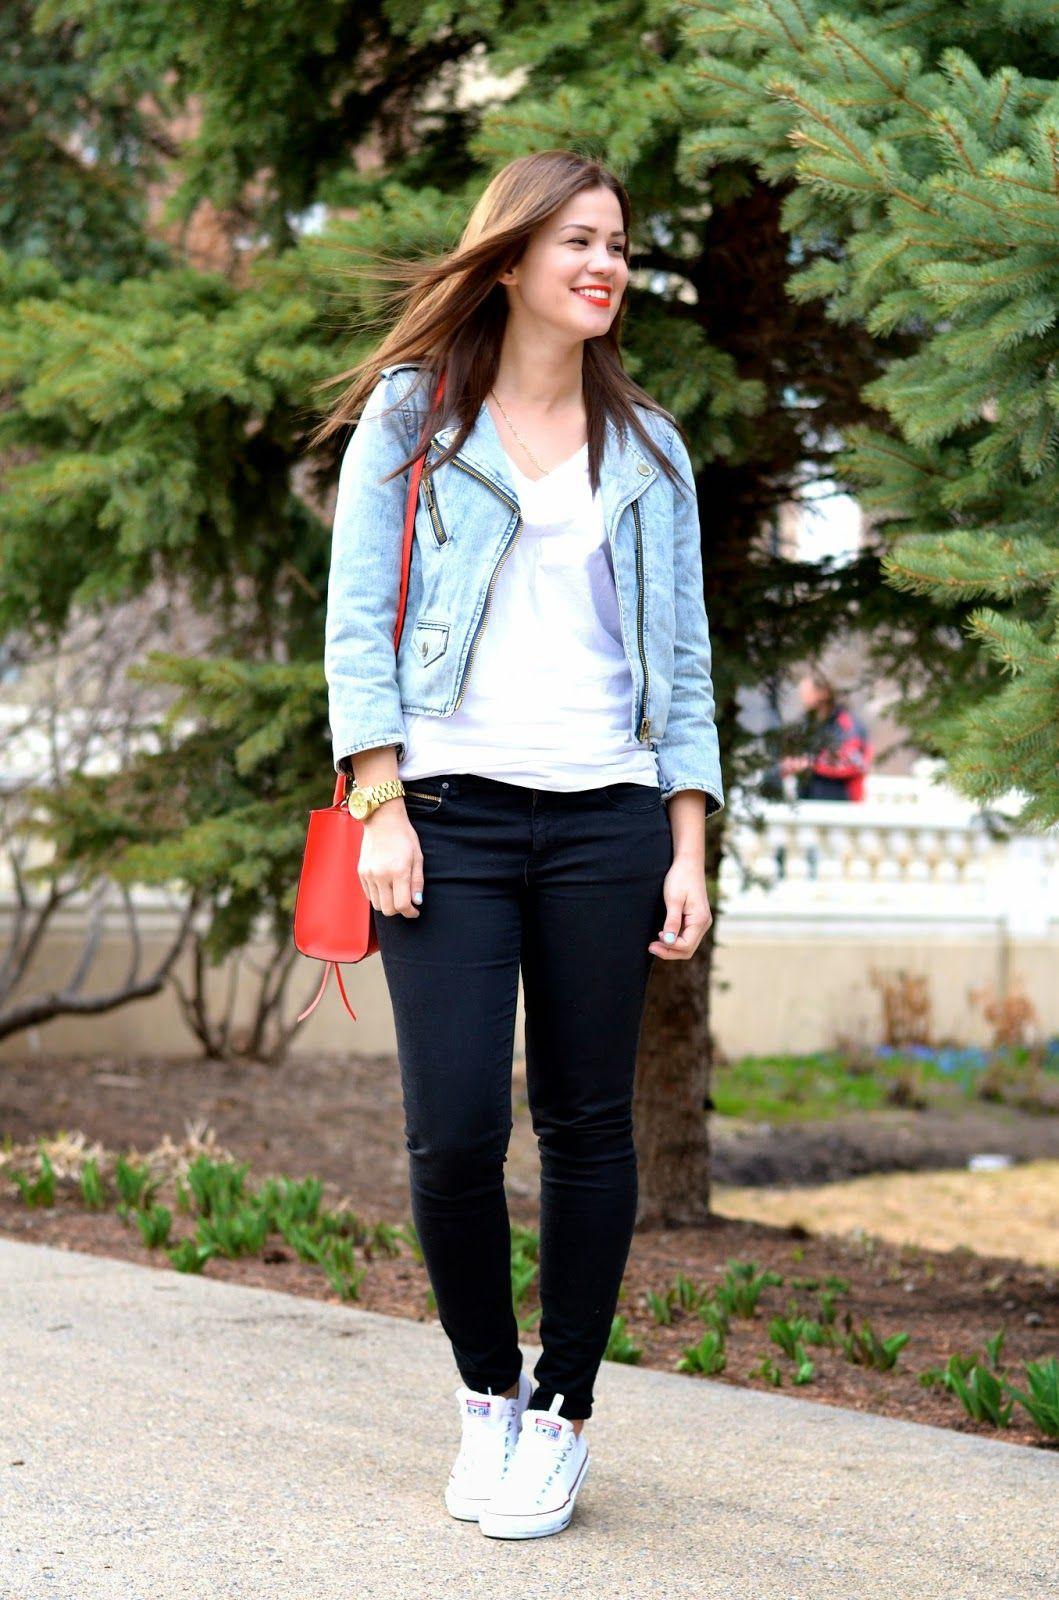 Denim moto jacket outfit, street fashion, casual wear, jean jacket, cobalt blue